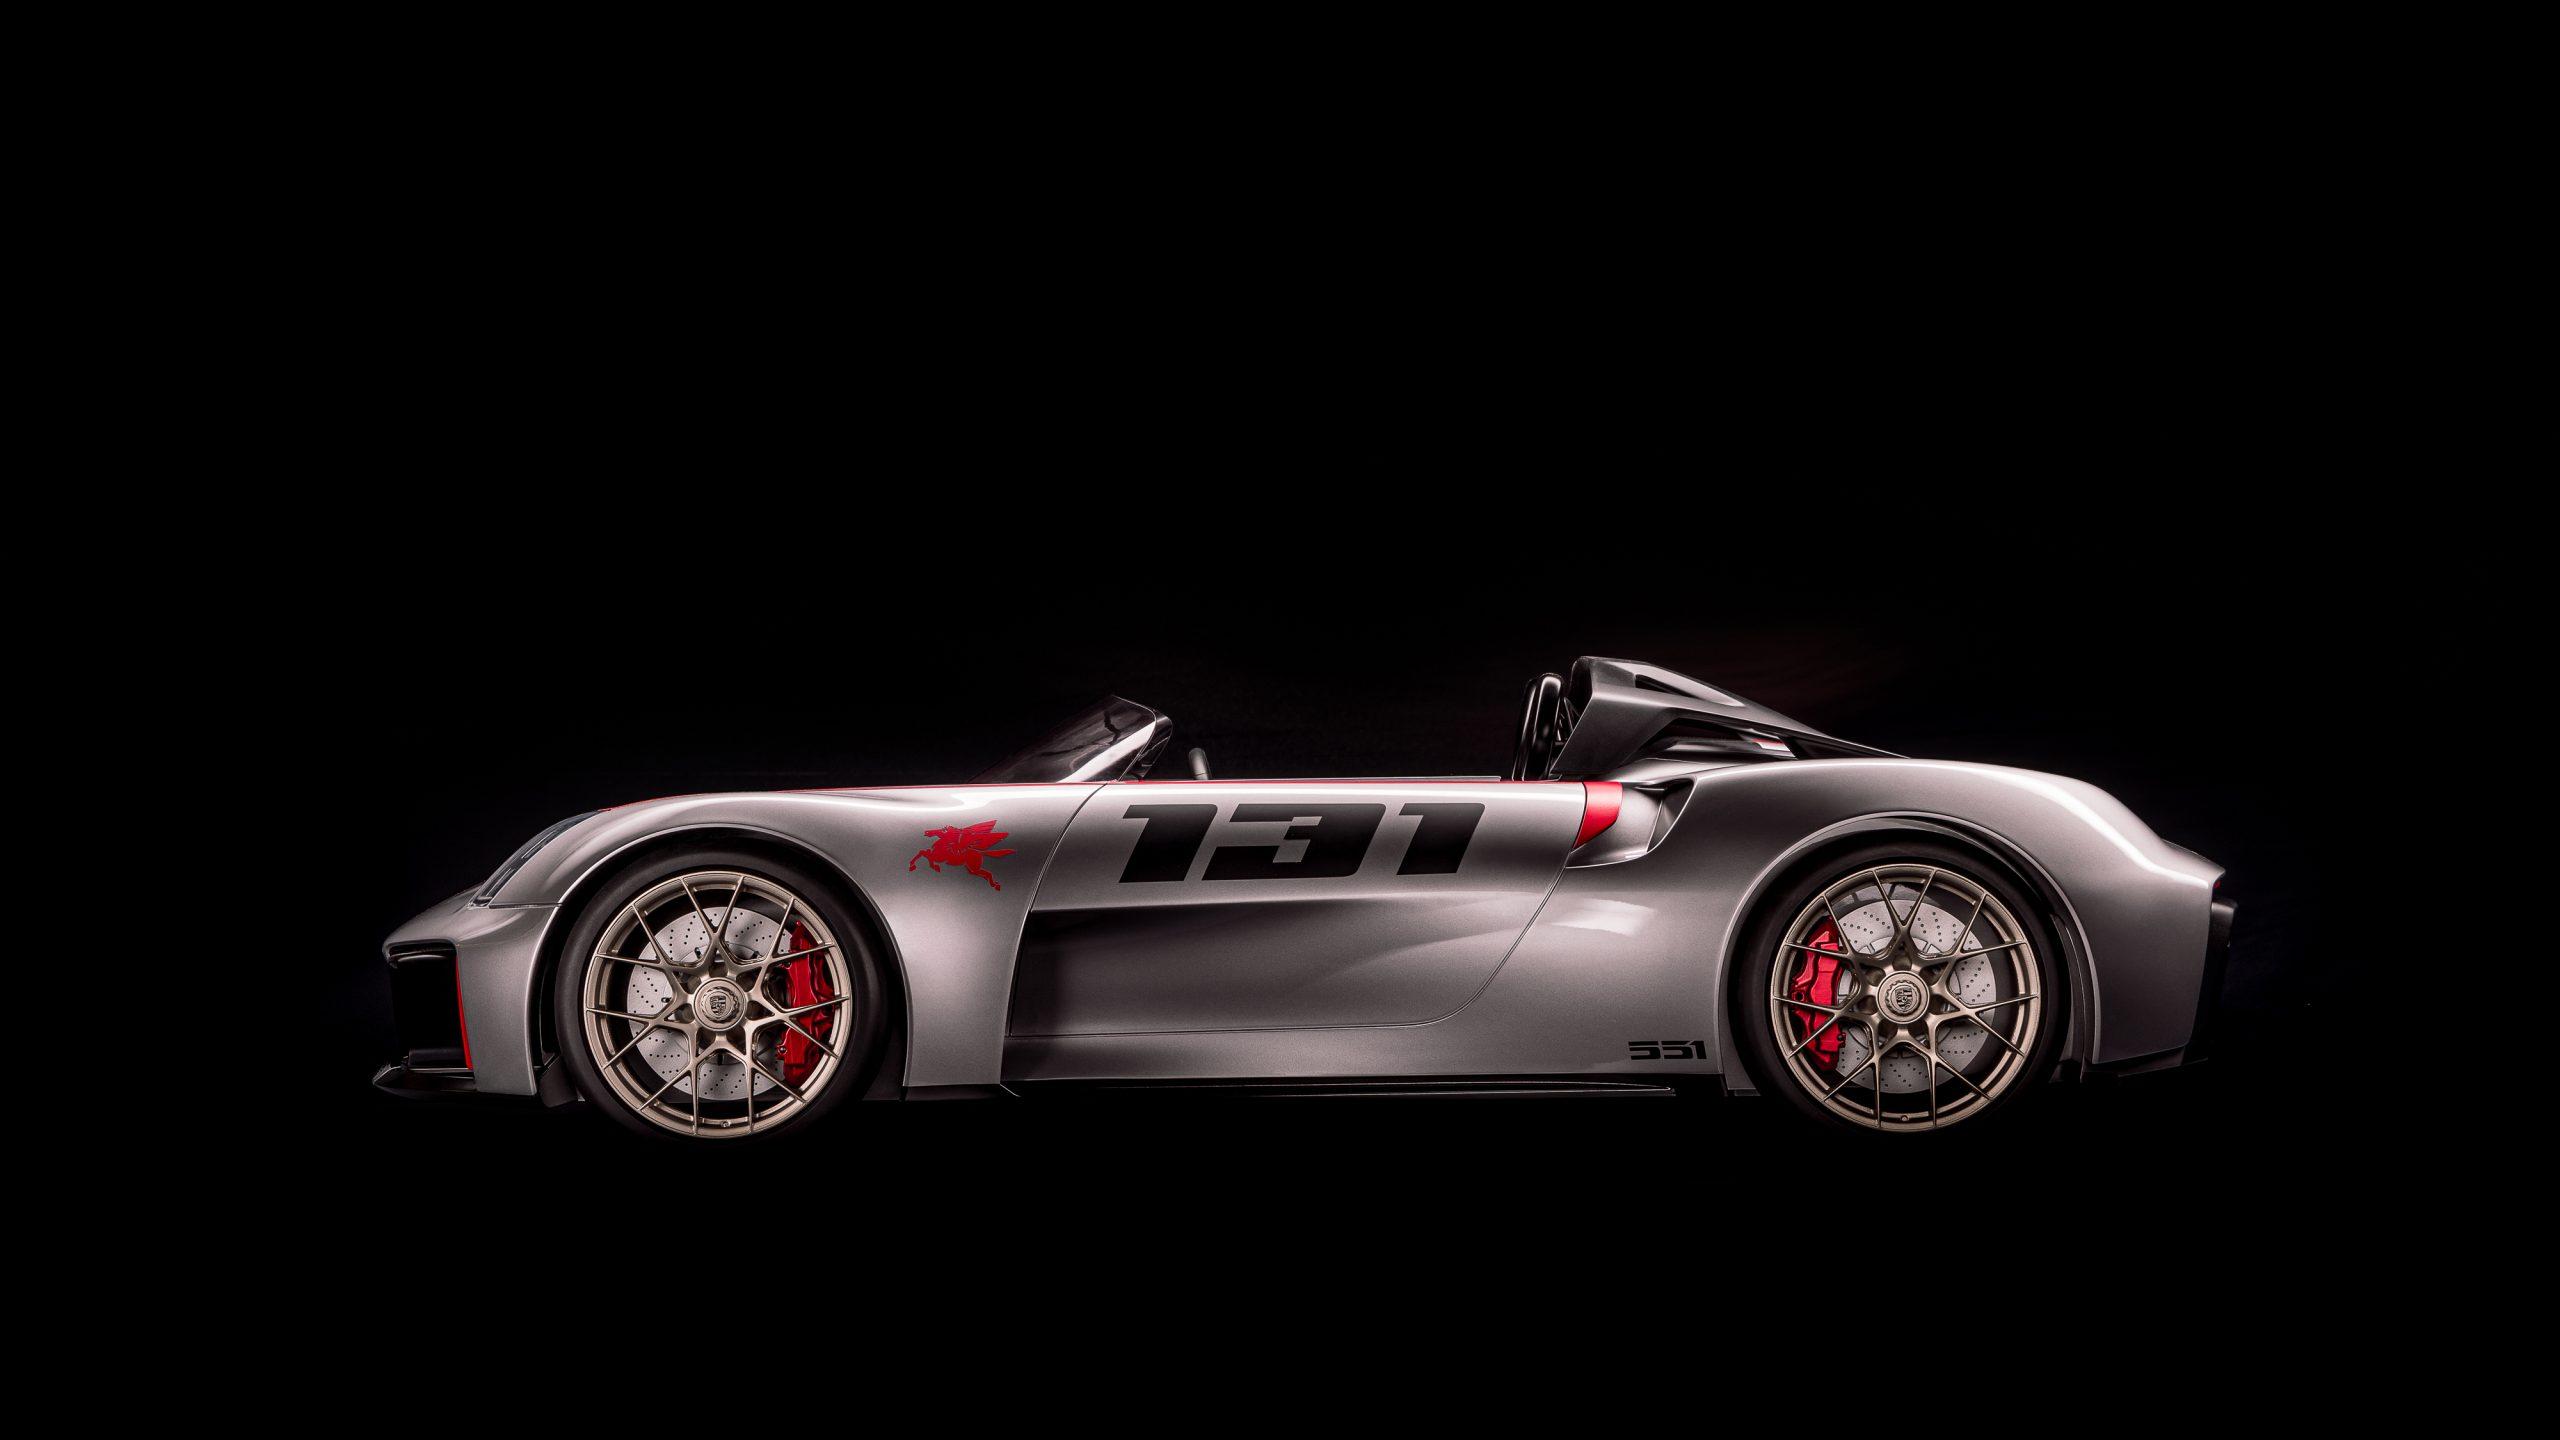 Porsche vision spyder side